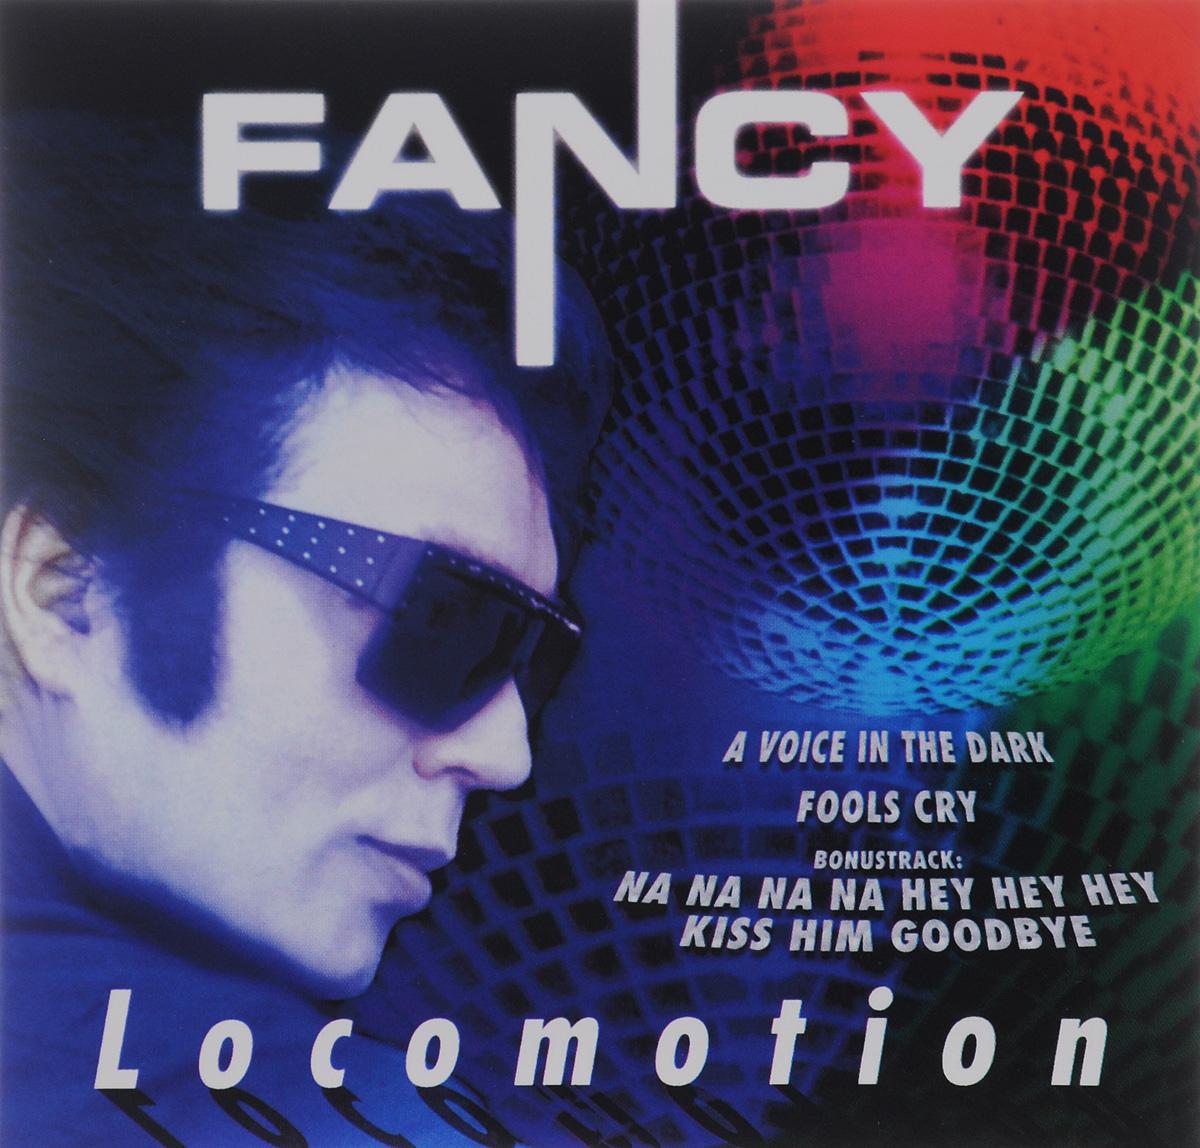 Fancy Fancy. Locomotion fancy fancy locomotion